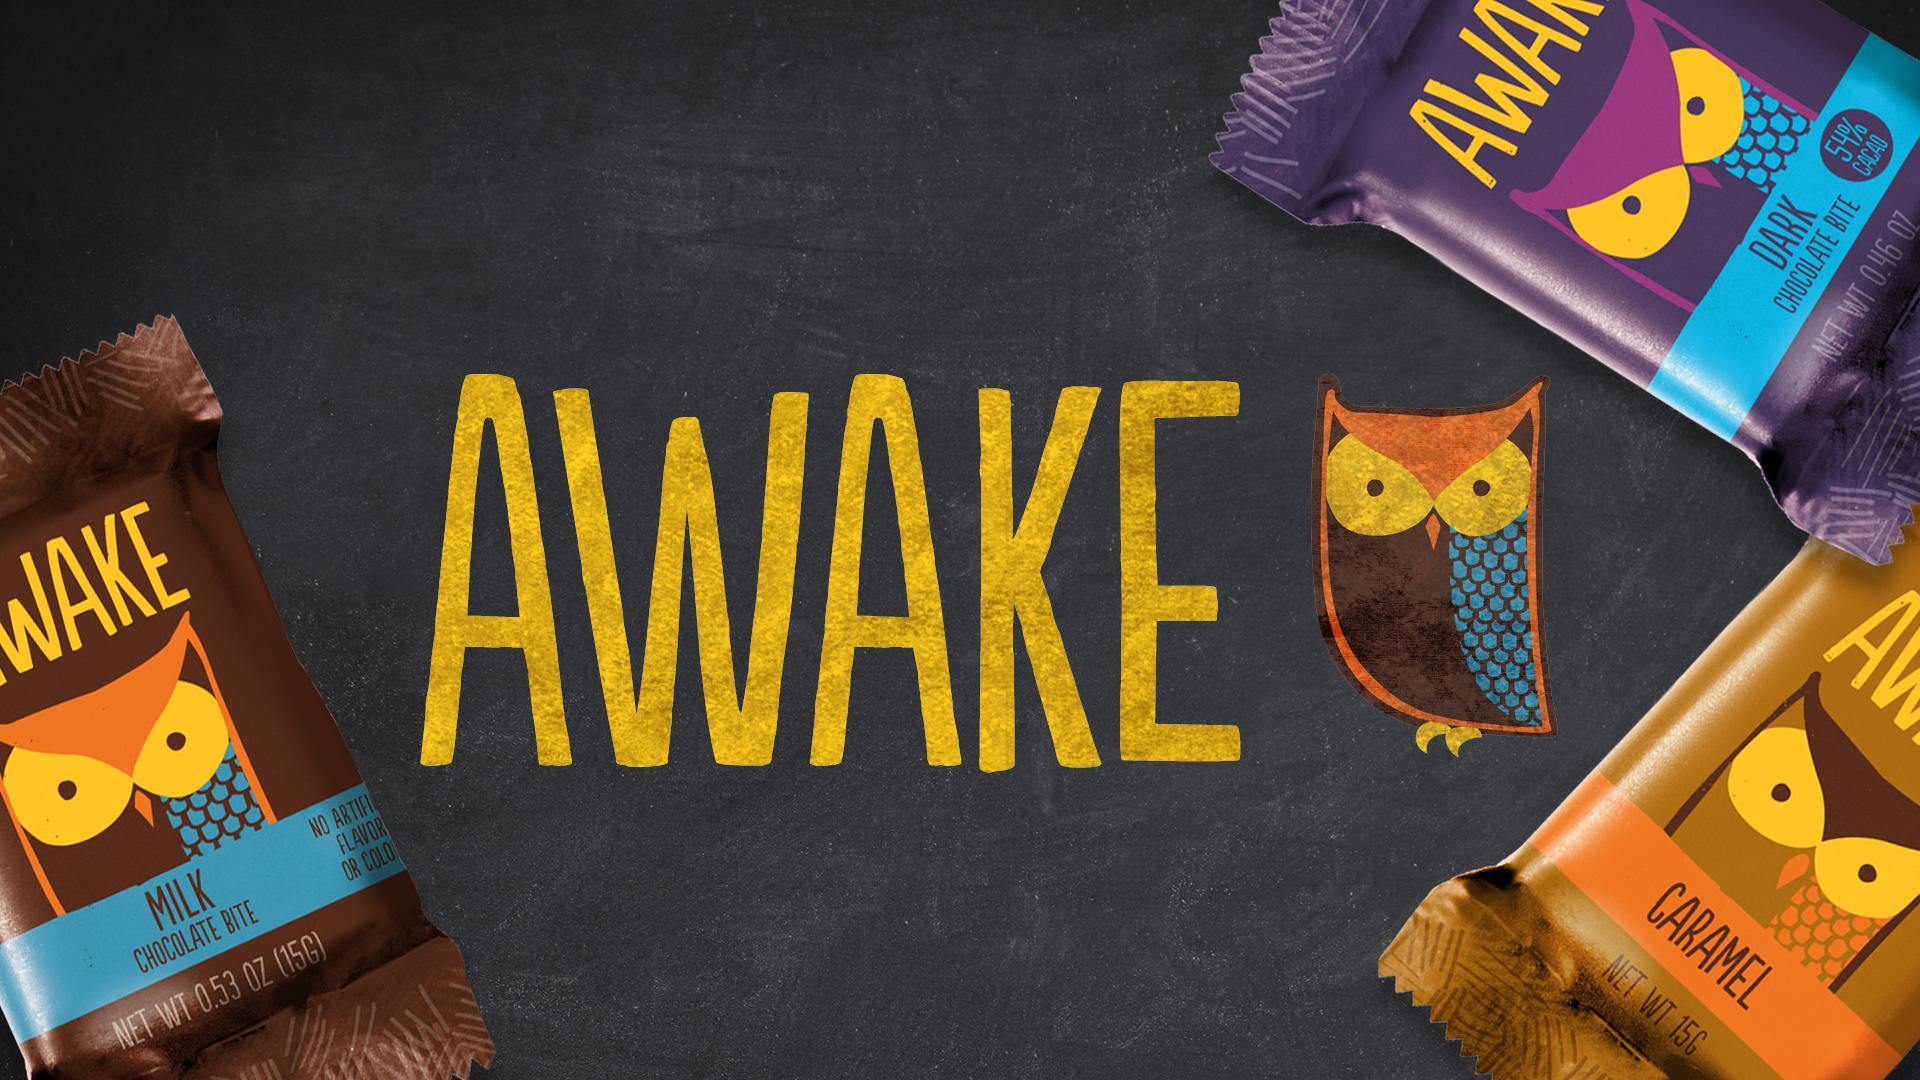 awakechocolate.png